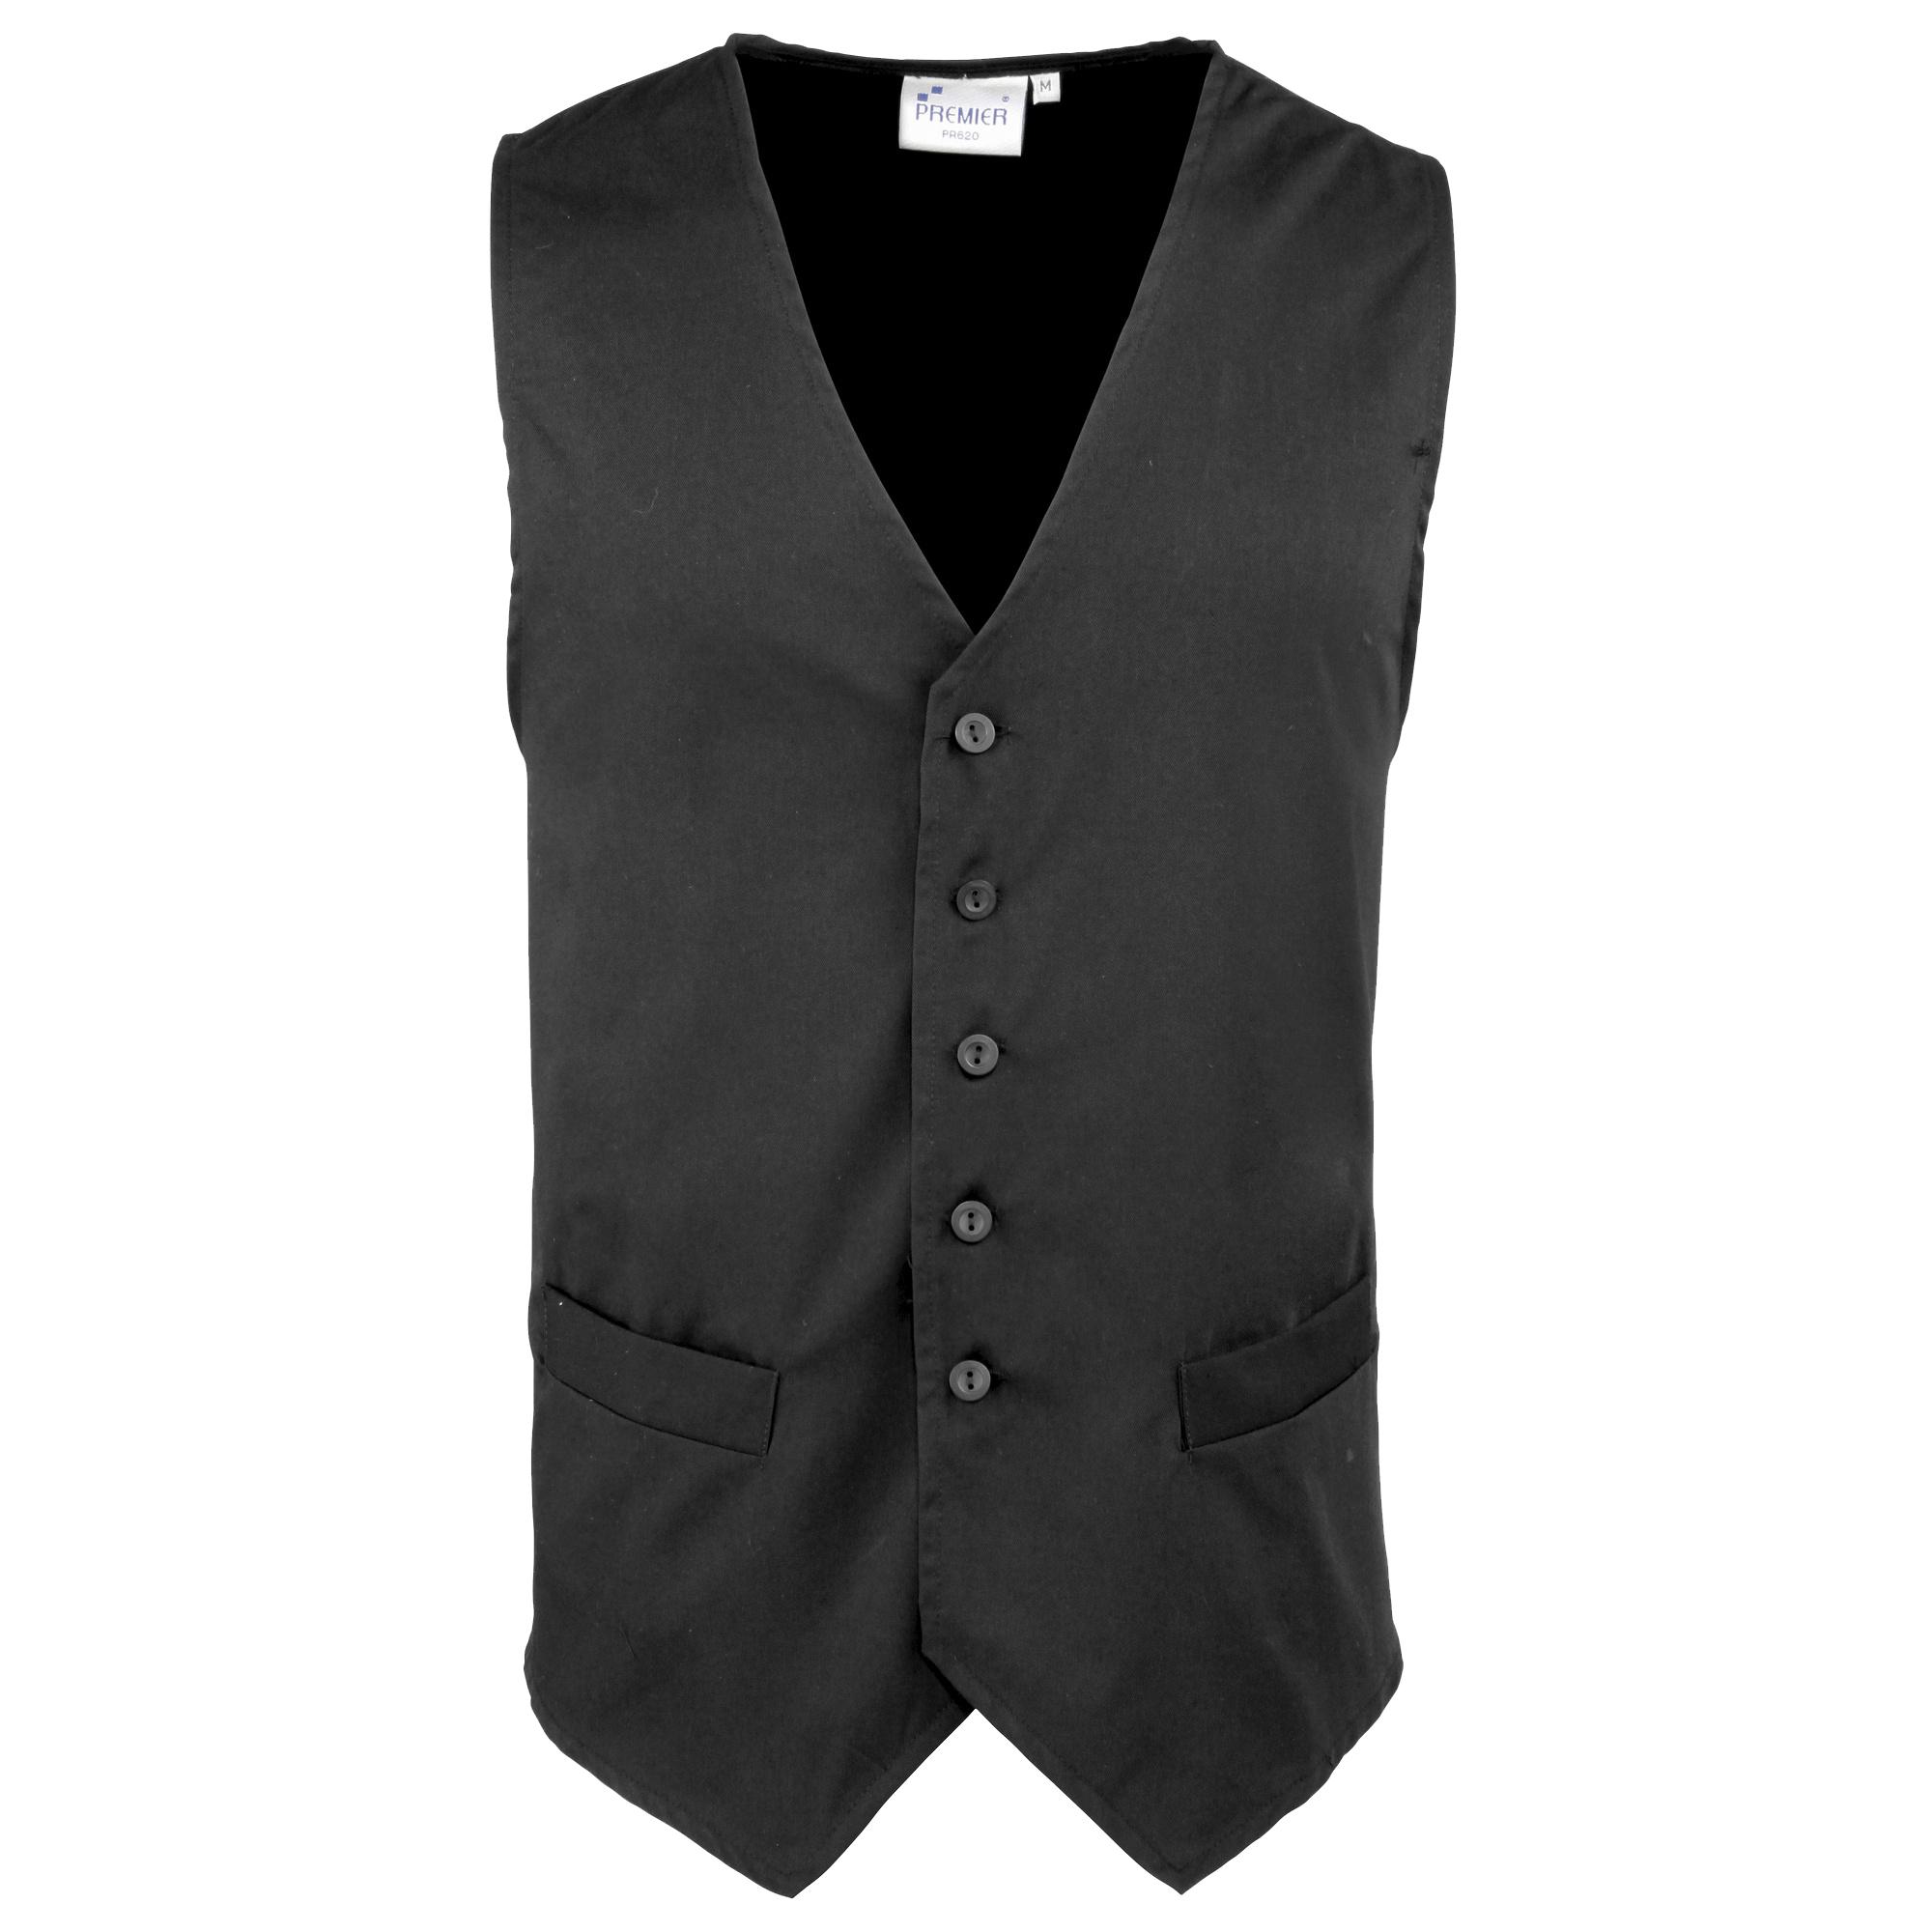 Premier Mens Hospitality / Bar / Catering Waistcoat (2XL) (Black)